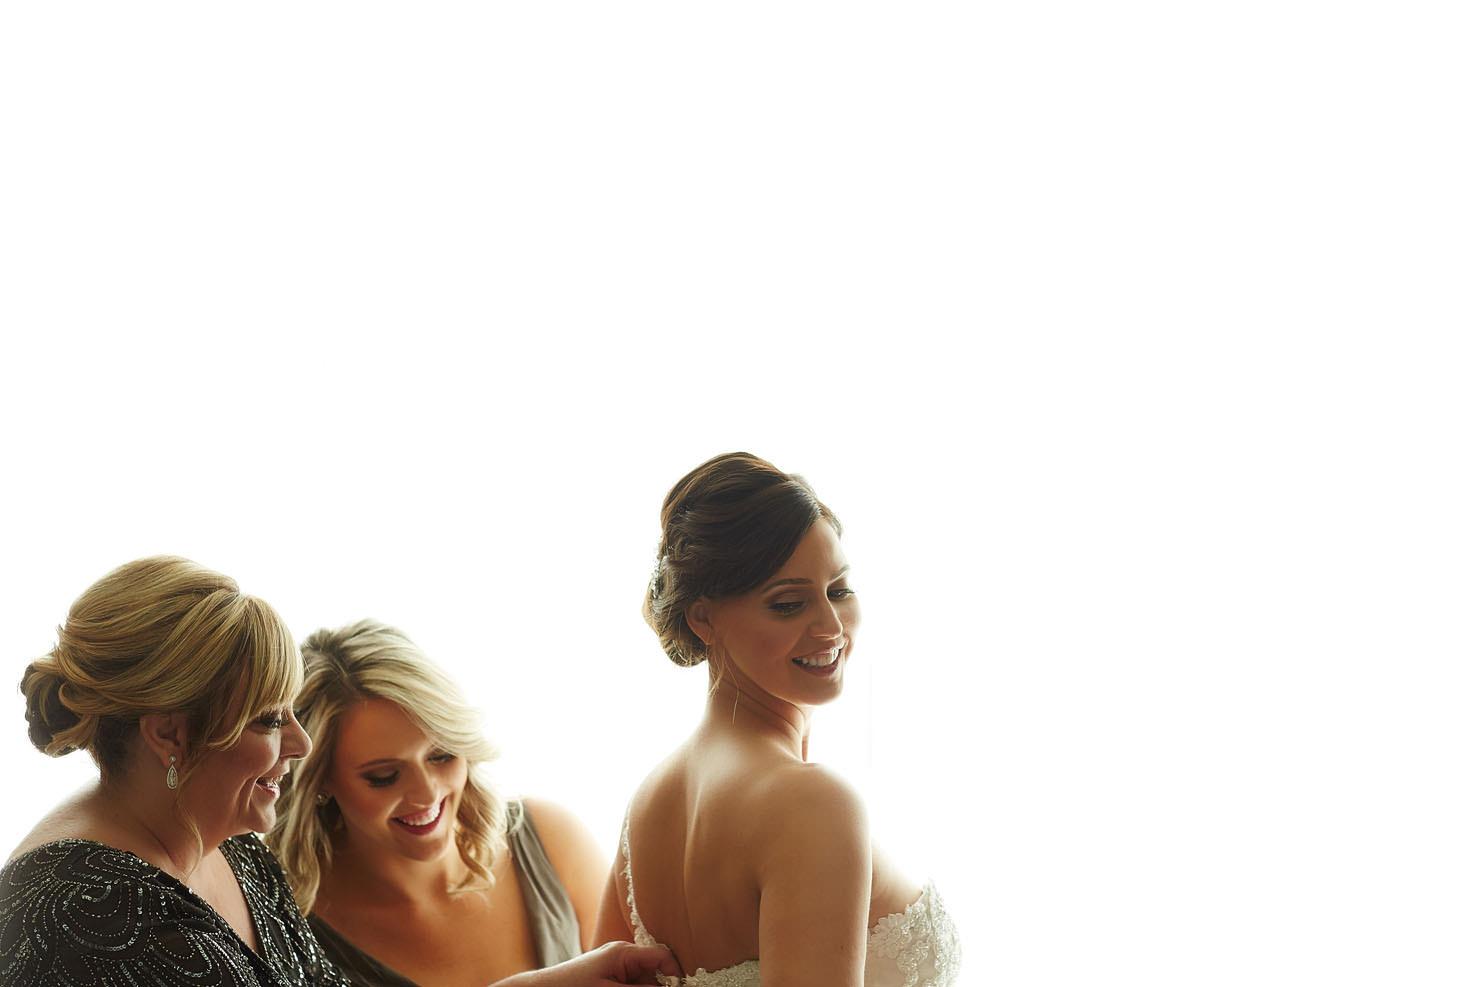 07_Venue-One-Wedding_Chicago_the-wit_0O3A2382 Venue One Wedding - Tracy & John